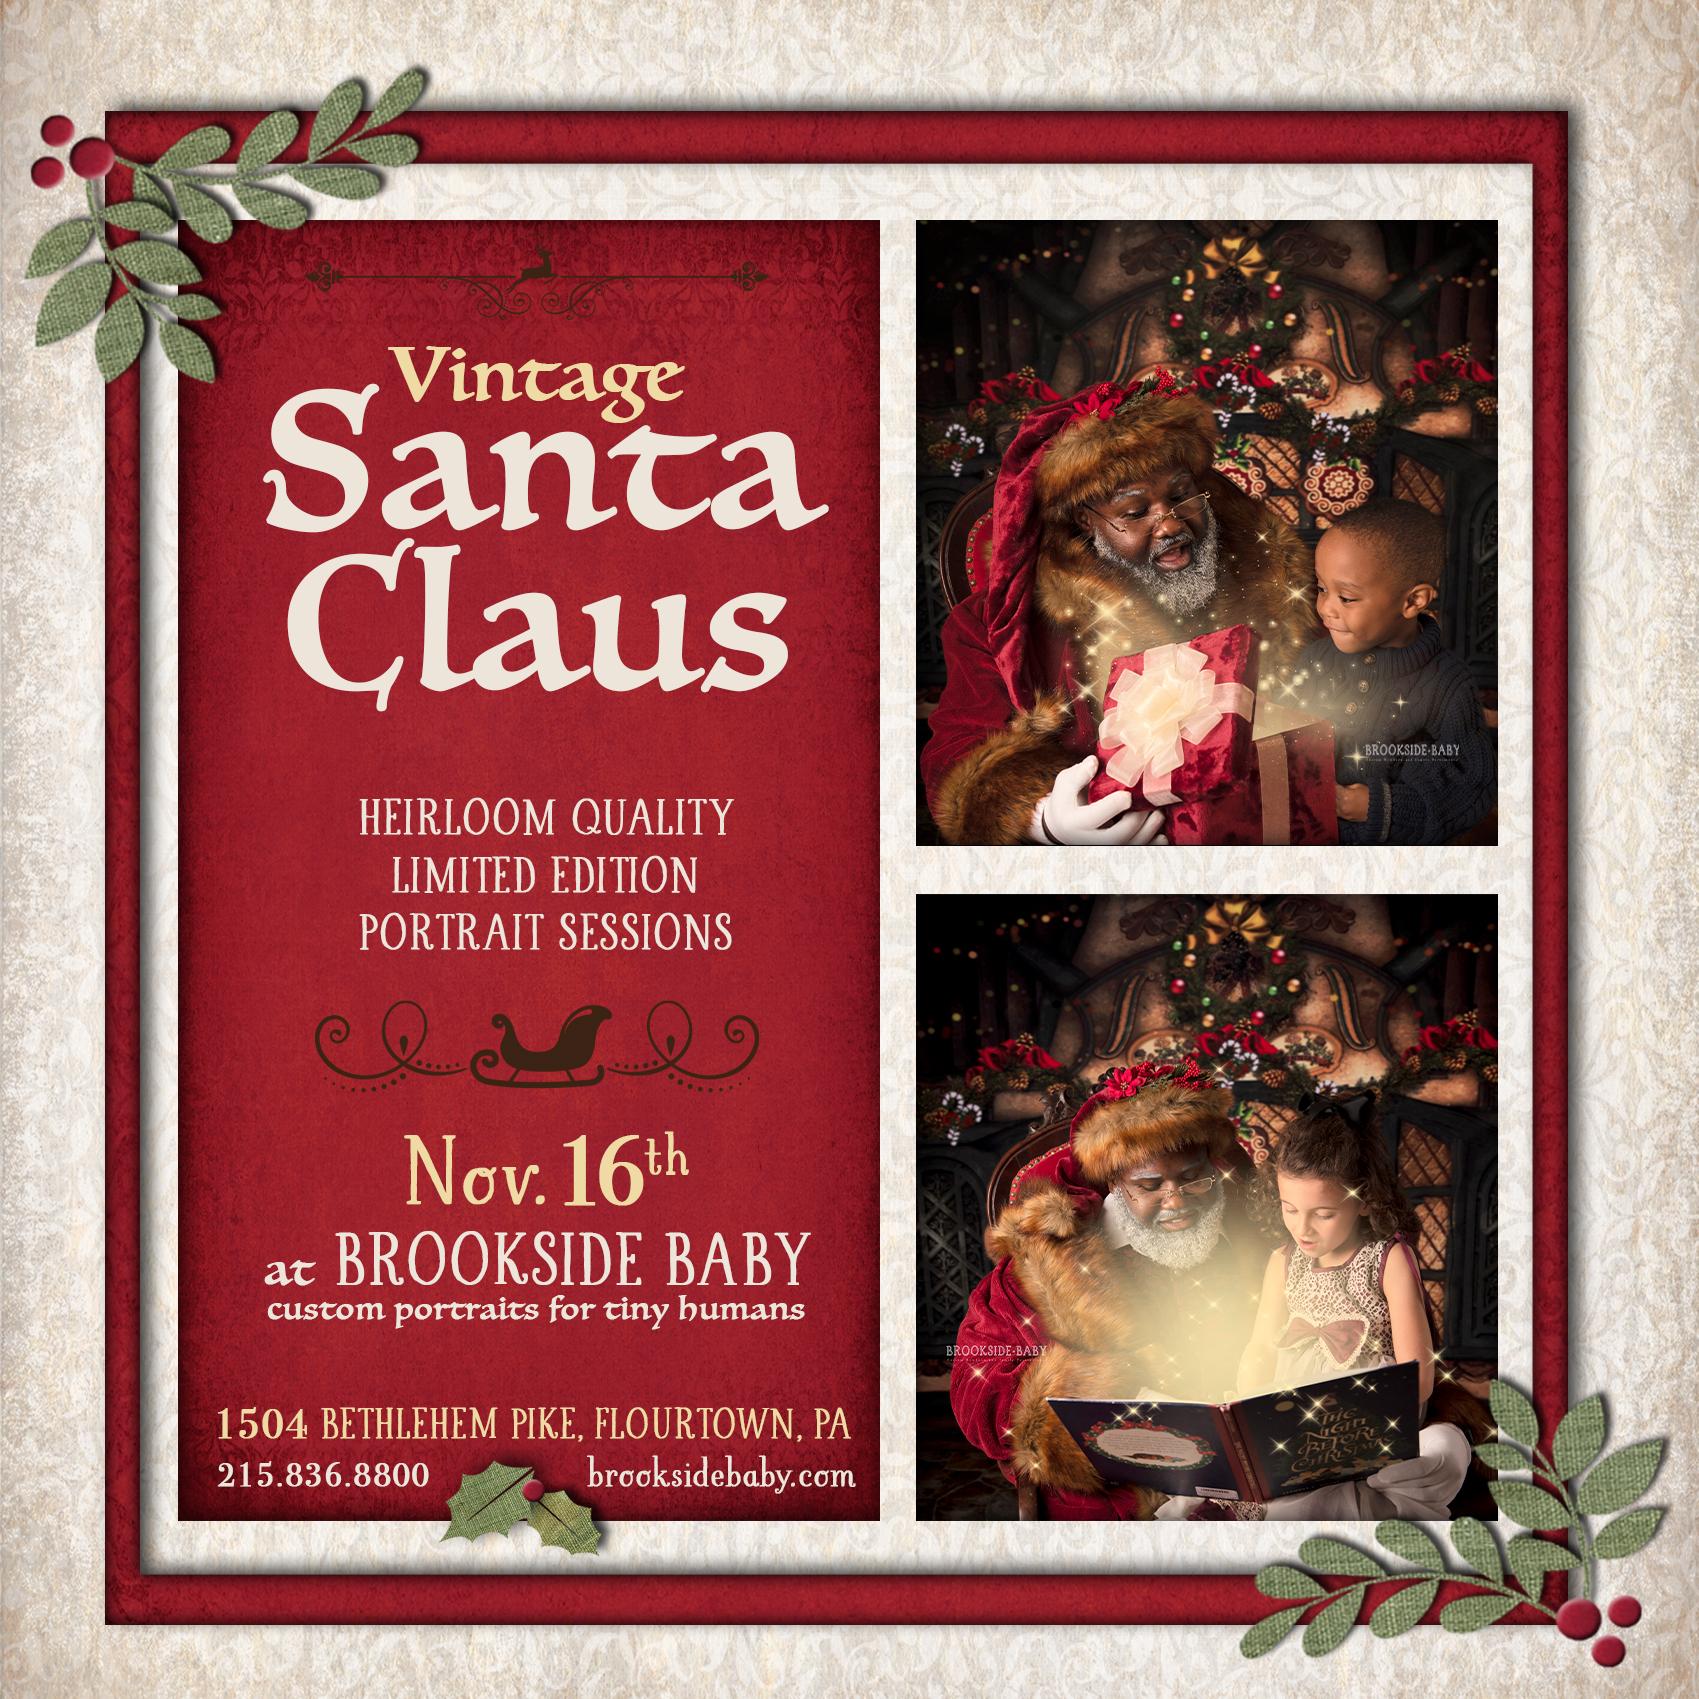 Vintage Santa Claus Portraits - Nov. 16th - Brookside Baby